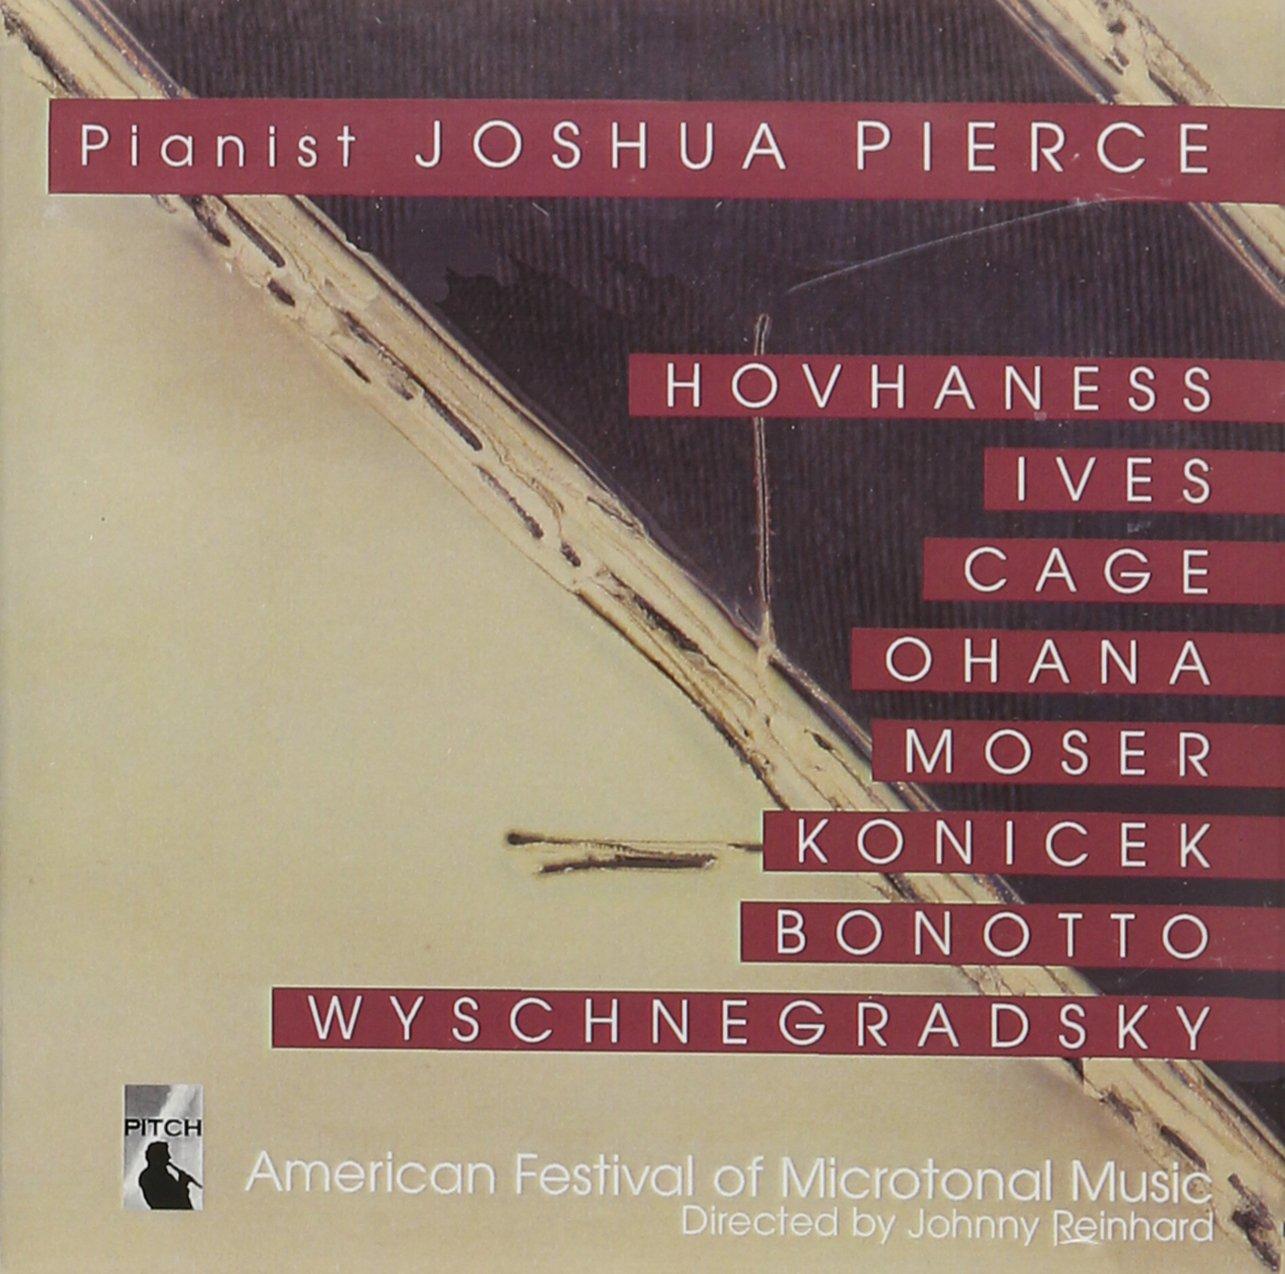 25% OFF SALENEW very popular! Pianist Joshua Pierce